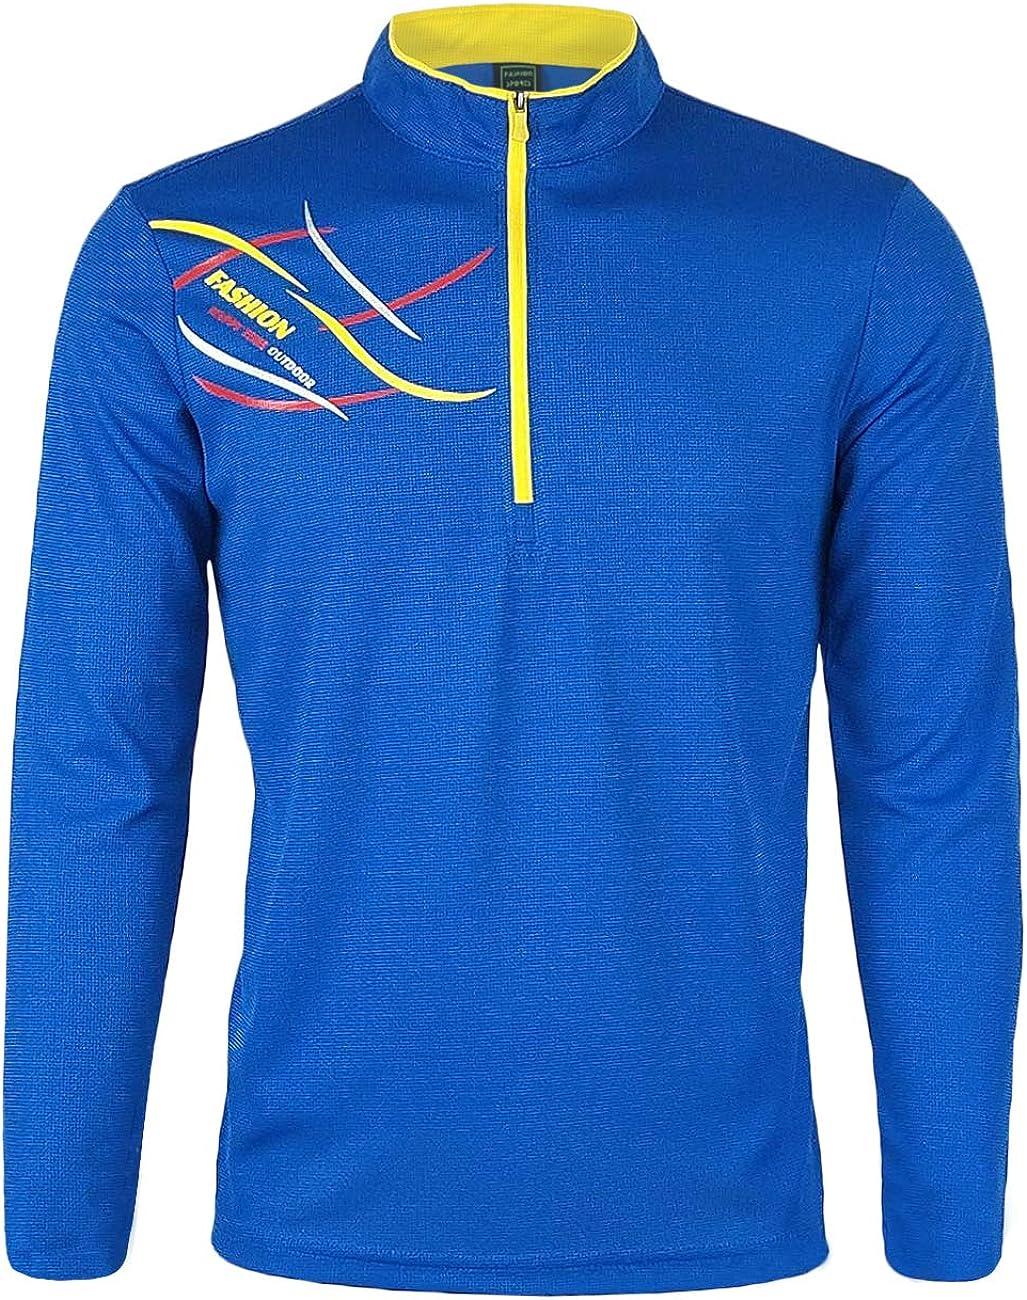 BALEAF Mens 1//4 Zip Pullover UPF 50 Sun Protection Thumbholes Long Sleeve Shirt for Hiking、Fishing、Camping